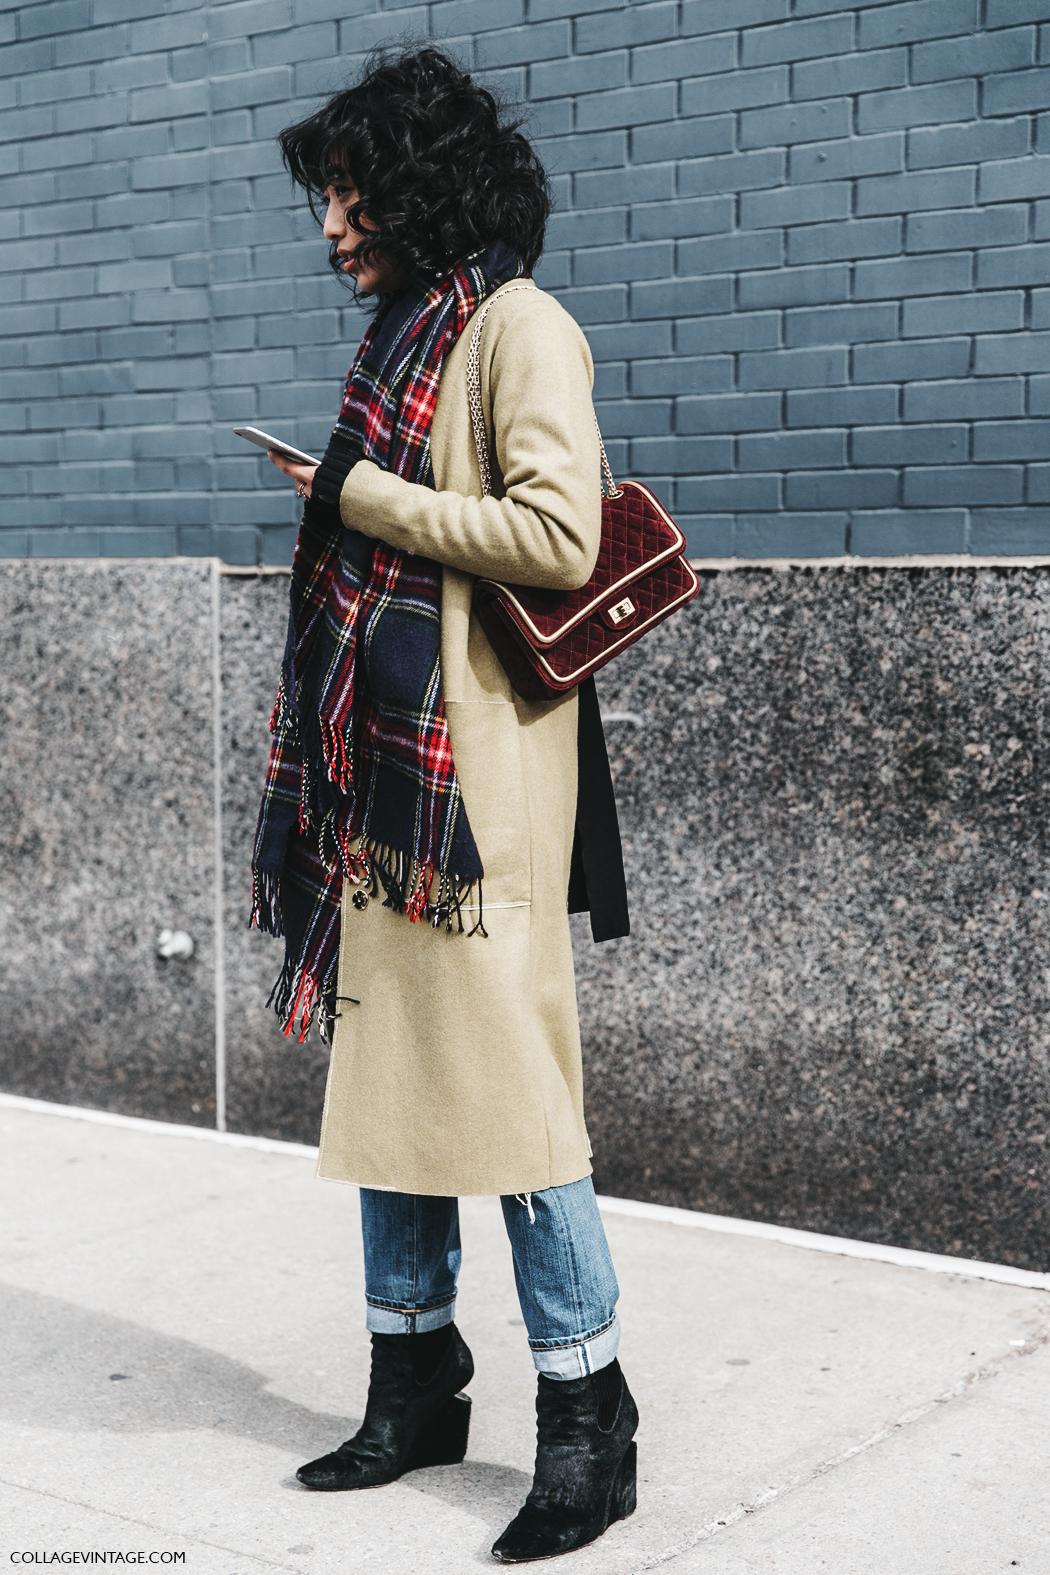 NYFW-New_York_Fashion_Week-Fall_Winter-17-Street_Style-Margharet_Zang-